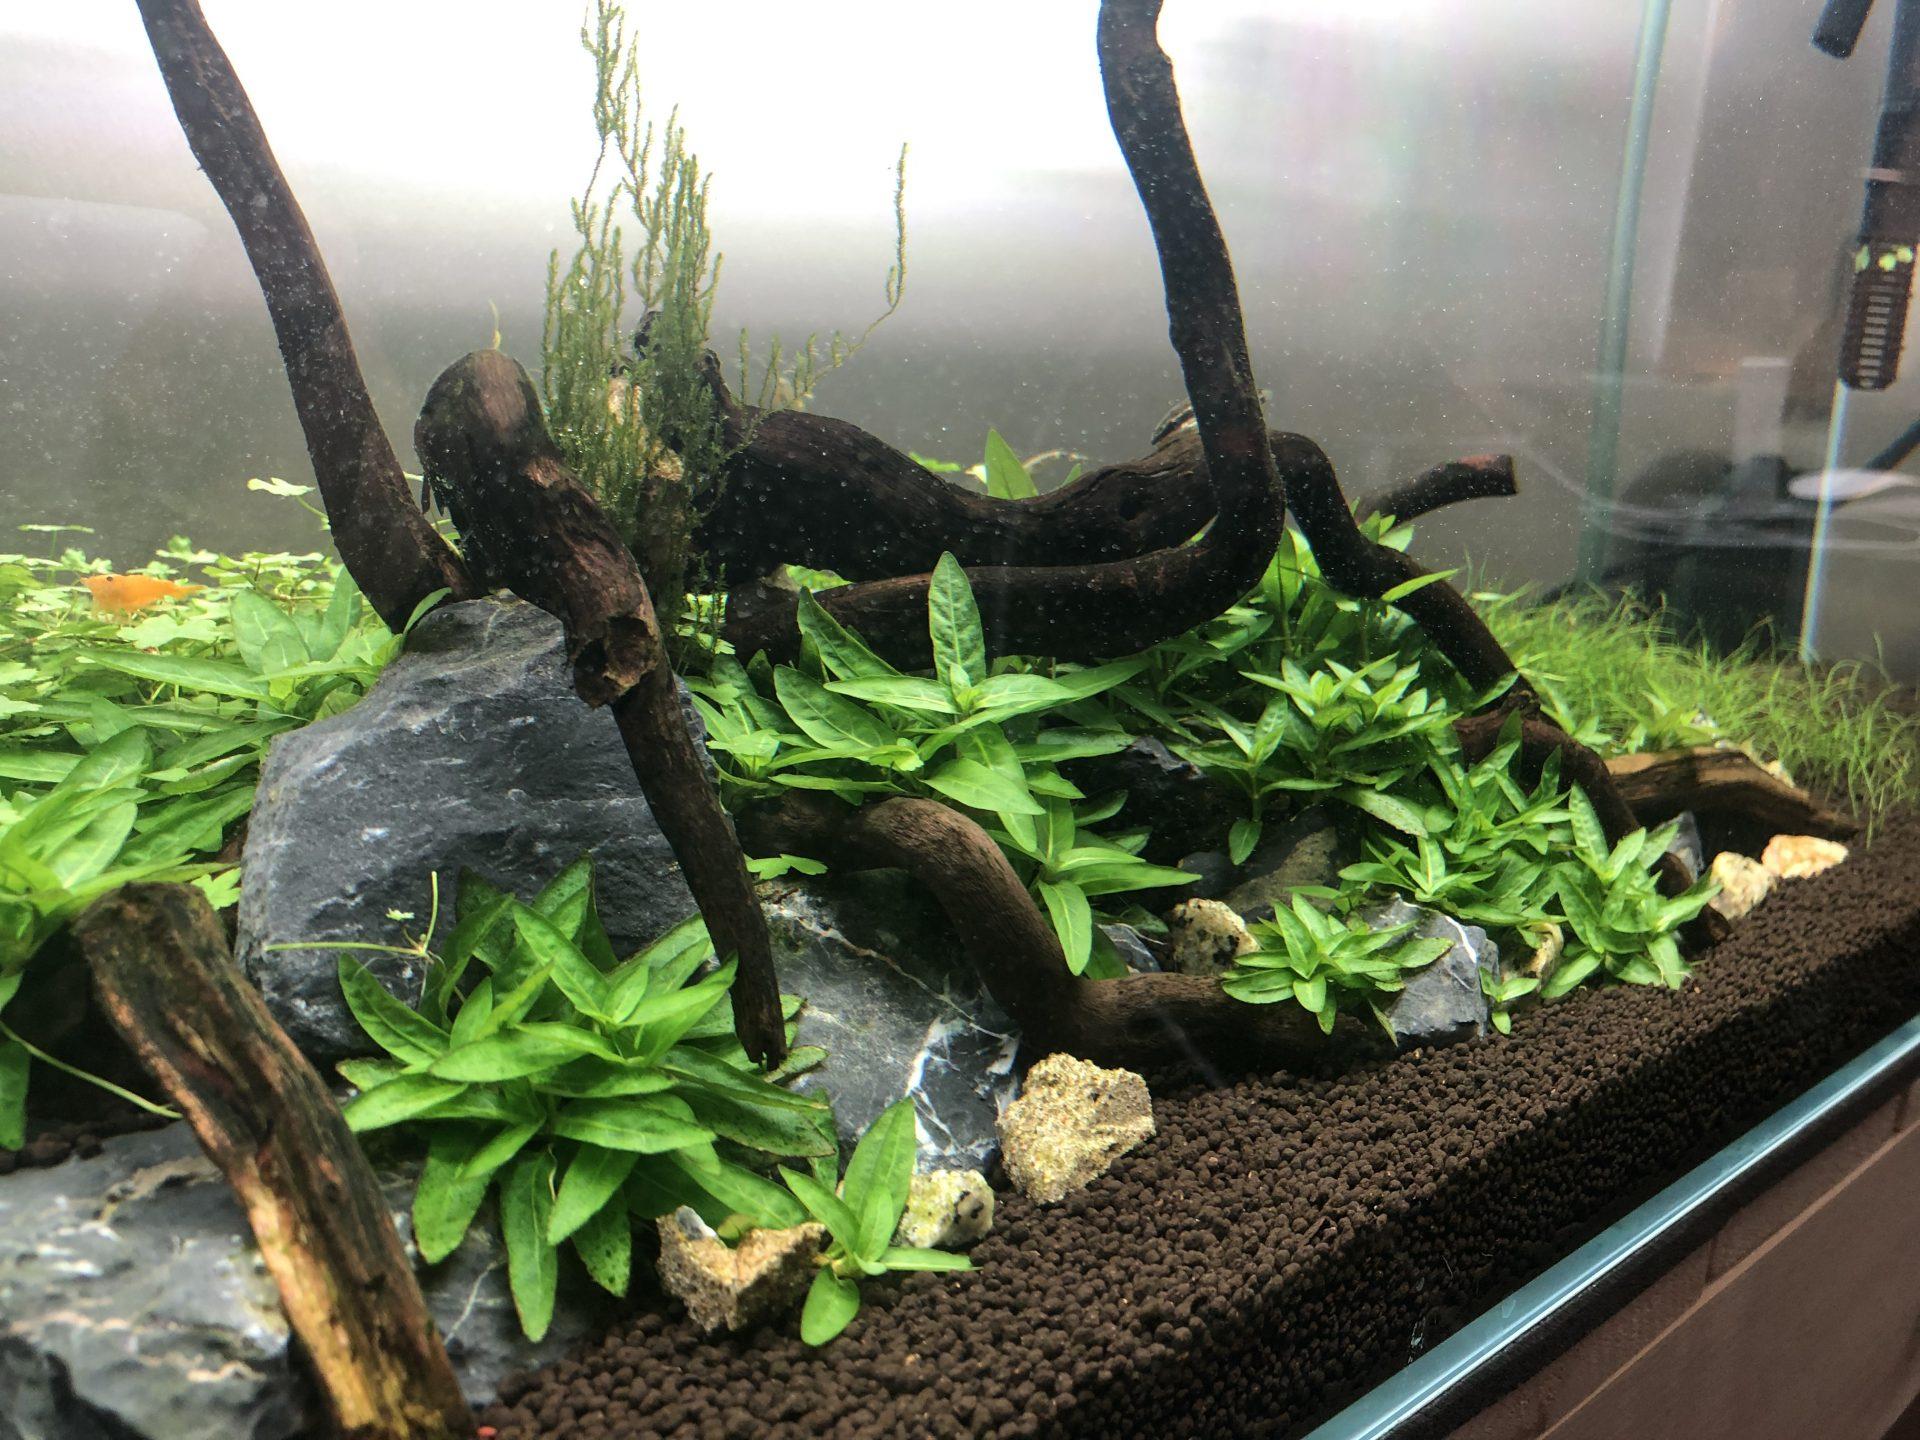 Aquarium DIY CO2 Kit: Citric Acid/Vinegar and Baking Soda – SWOG